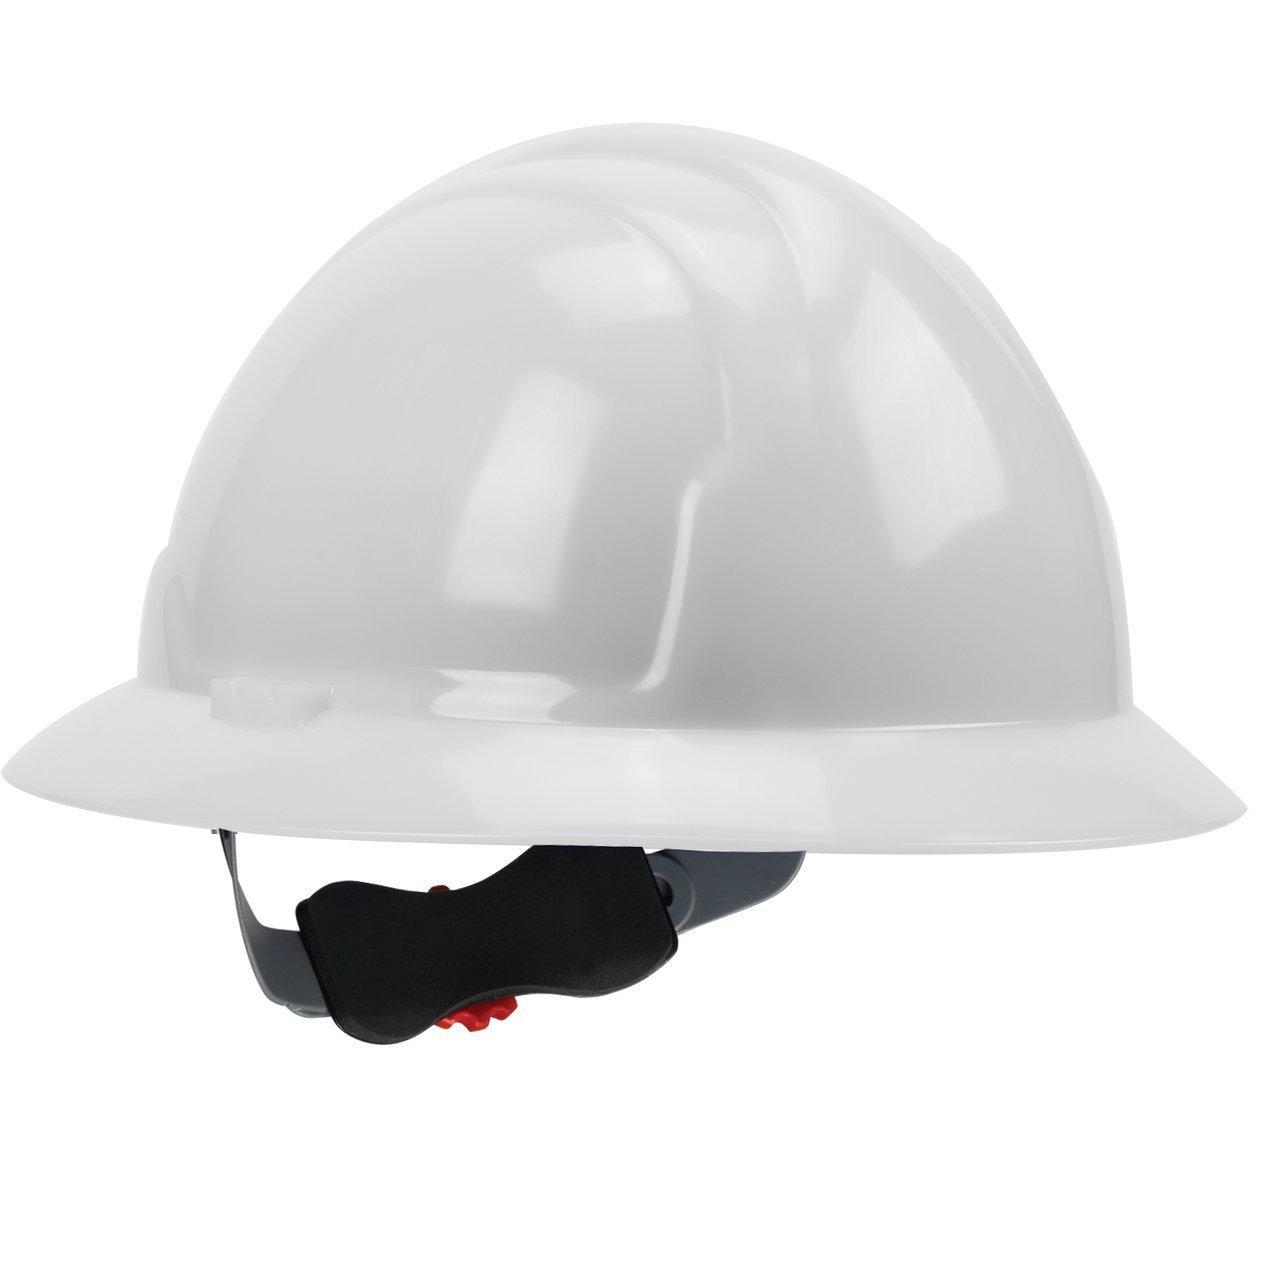 Safety Works Full Brim Style Hard Hat